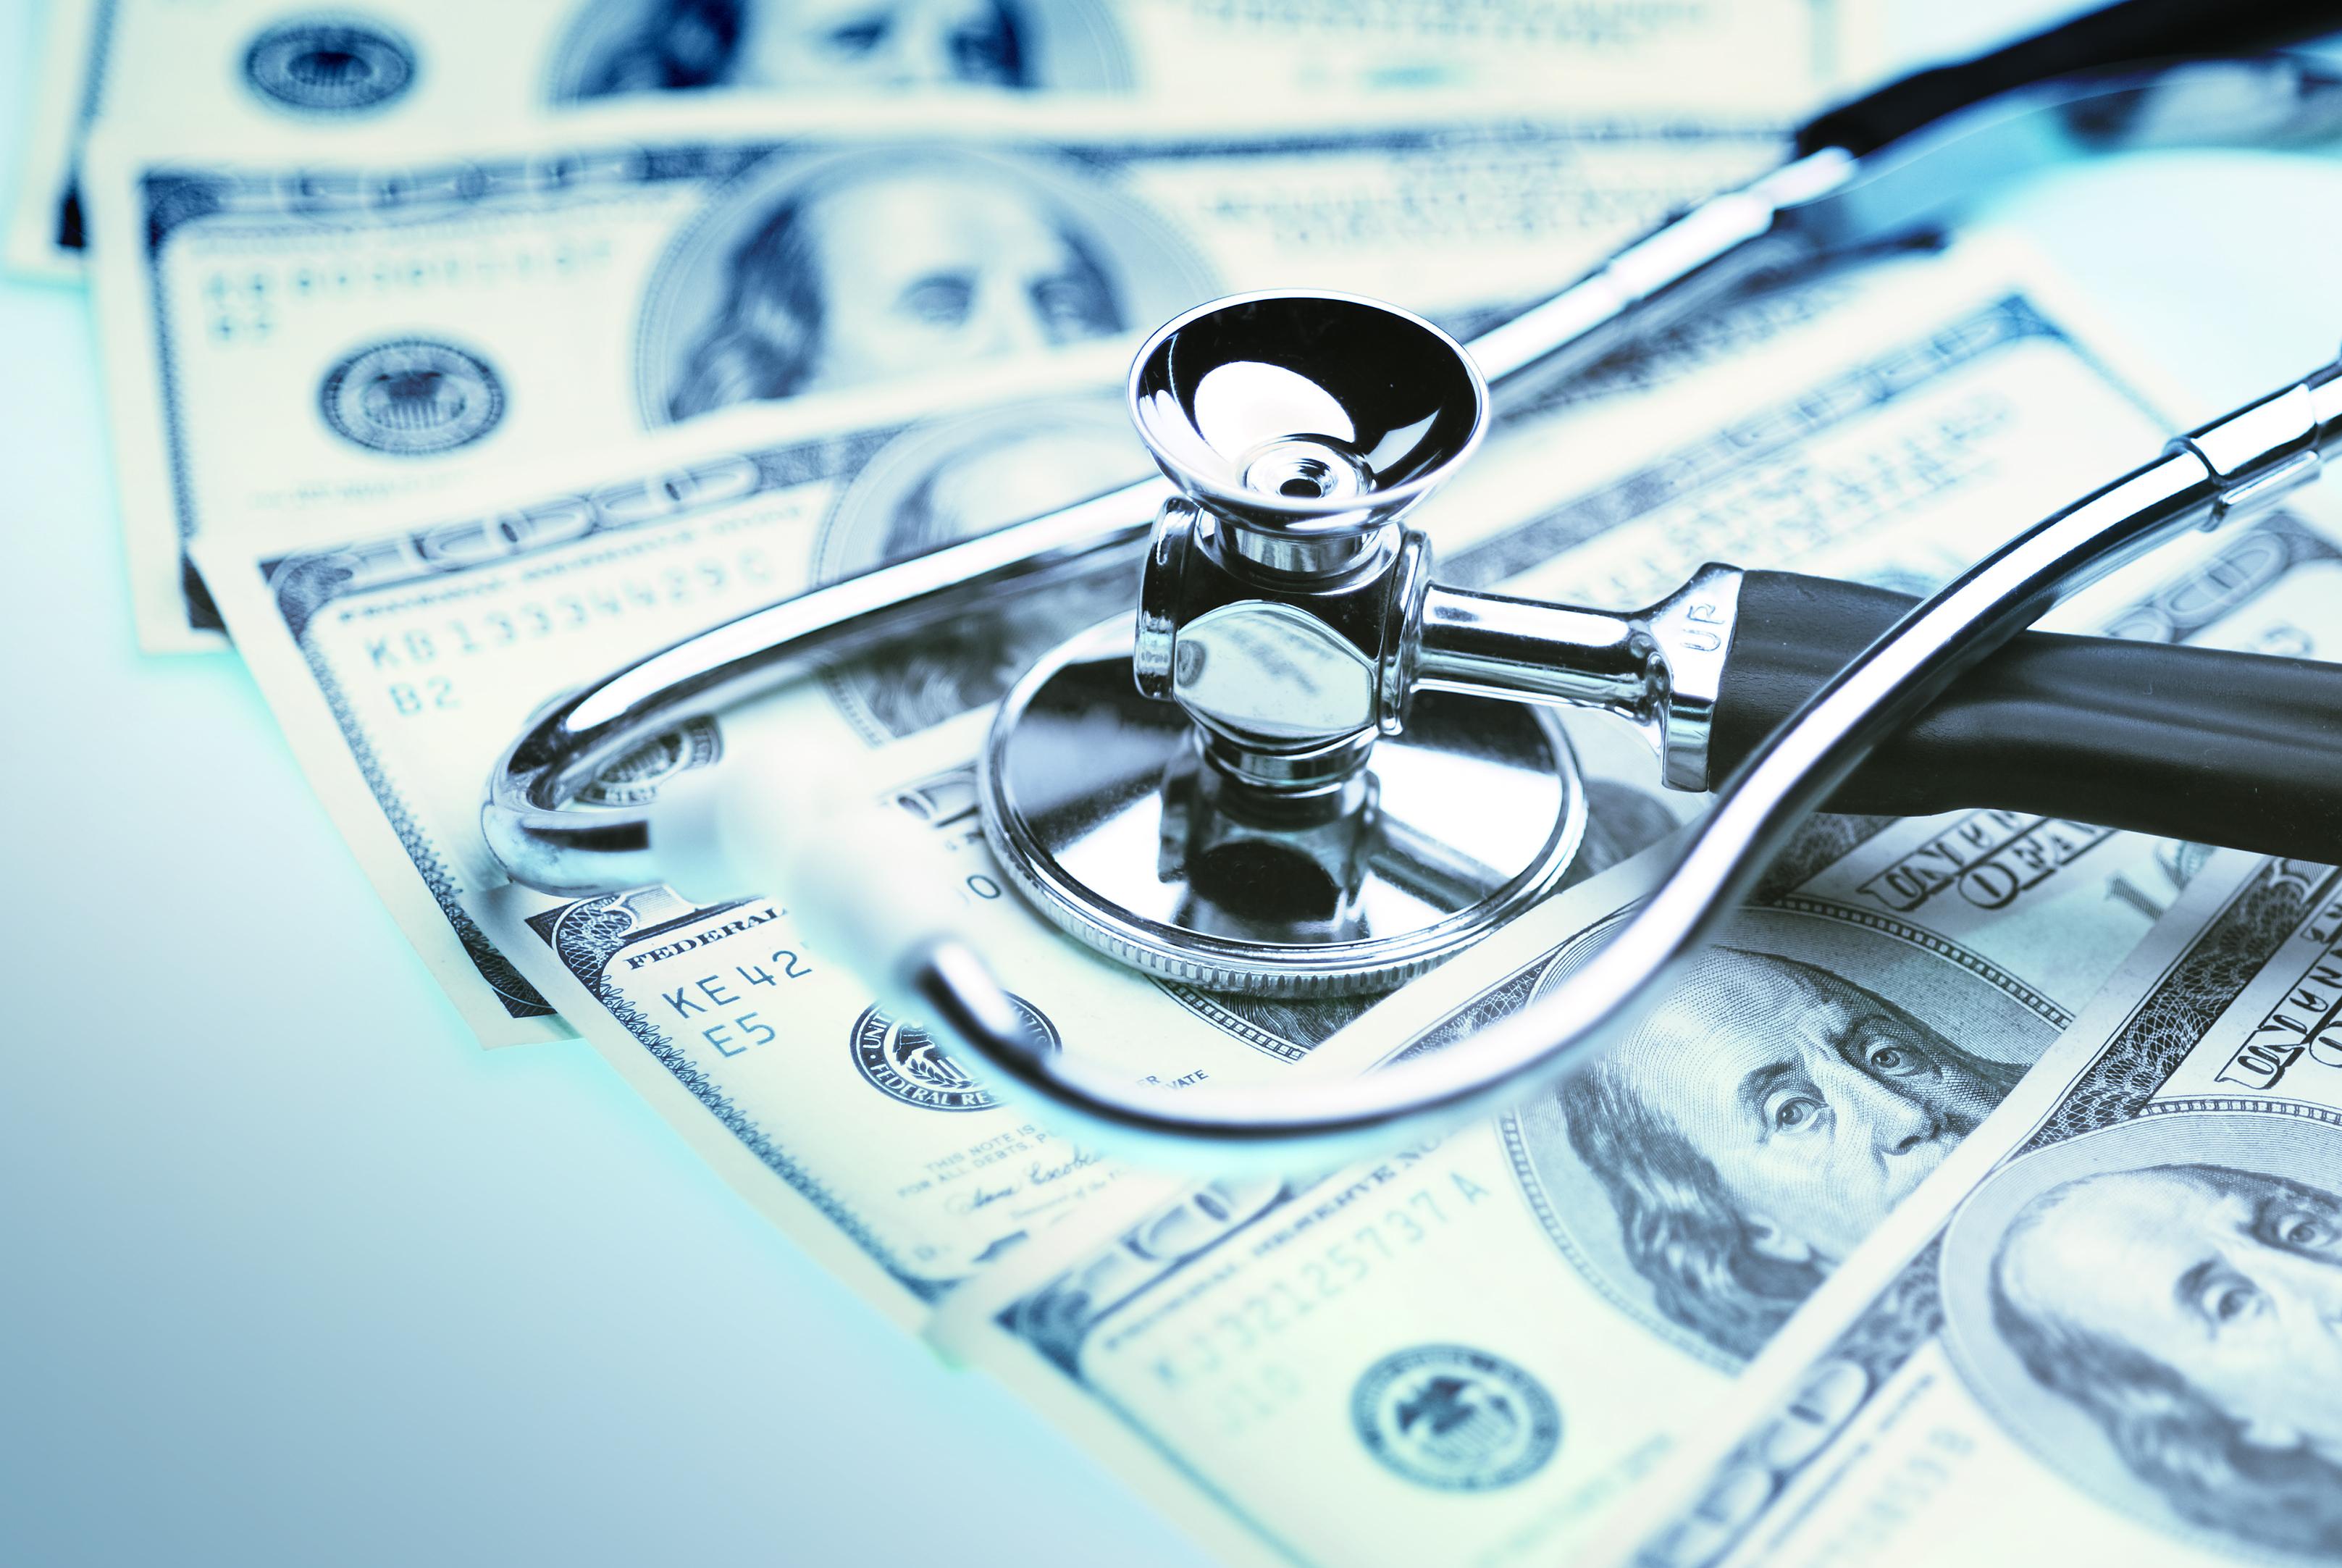 Money and Stethoscope